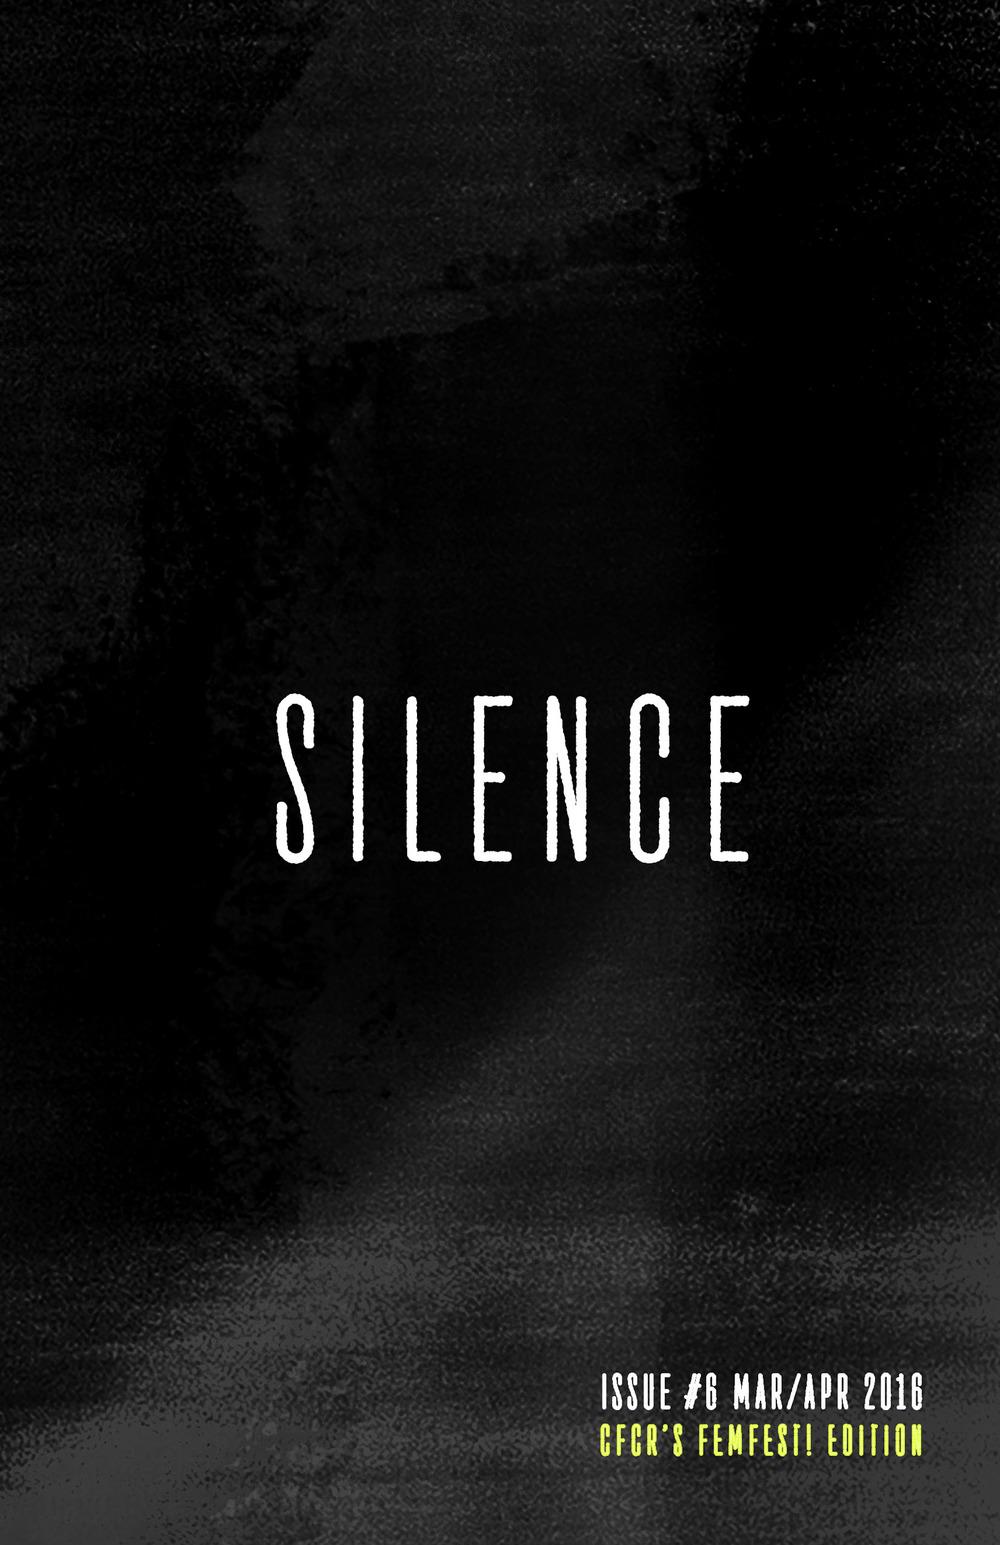 SILENCE-6-WORKING-V2-WEB.jpg